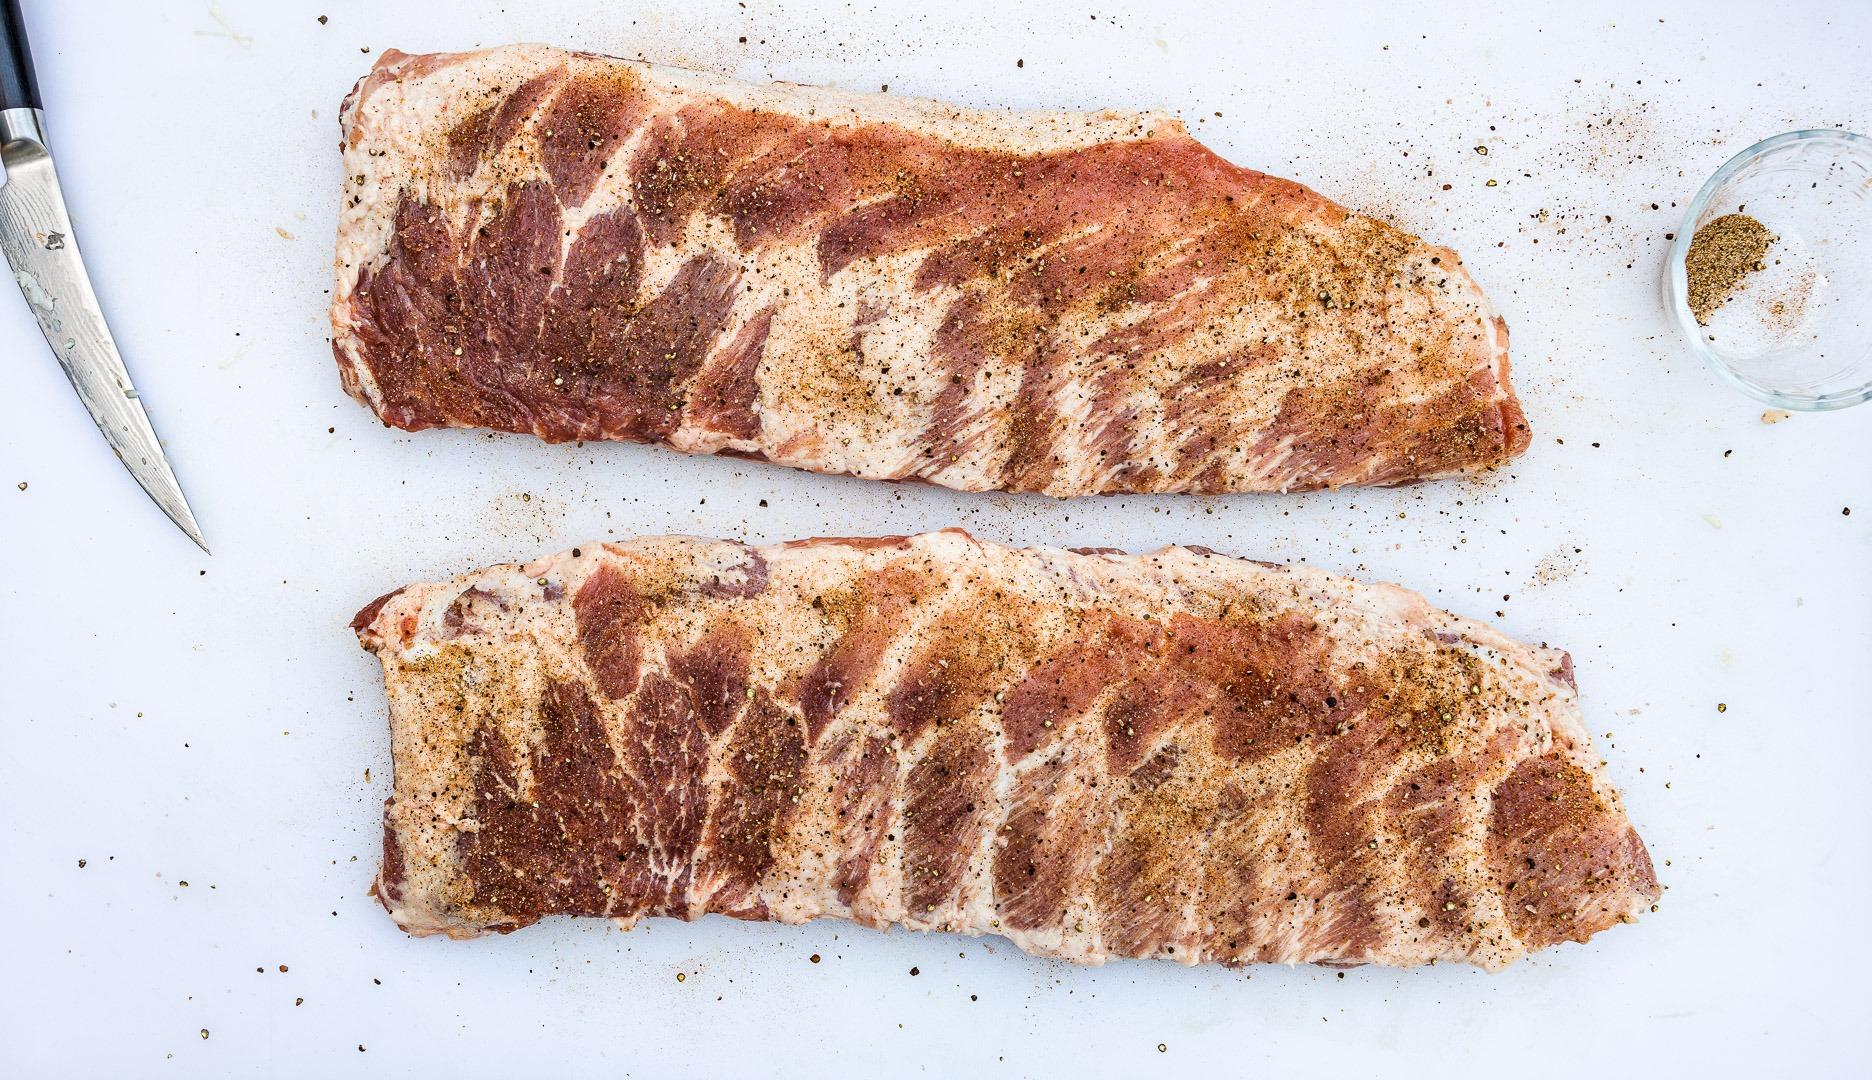 seasoned, trimmed ribs